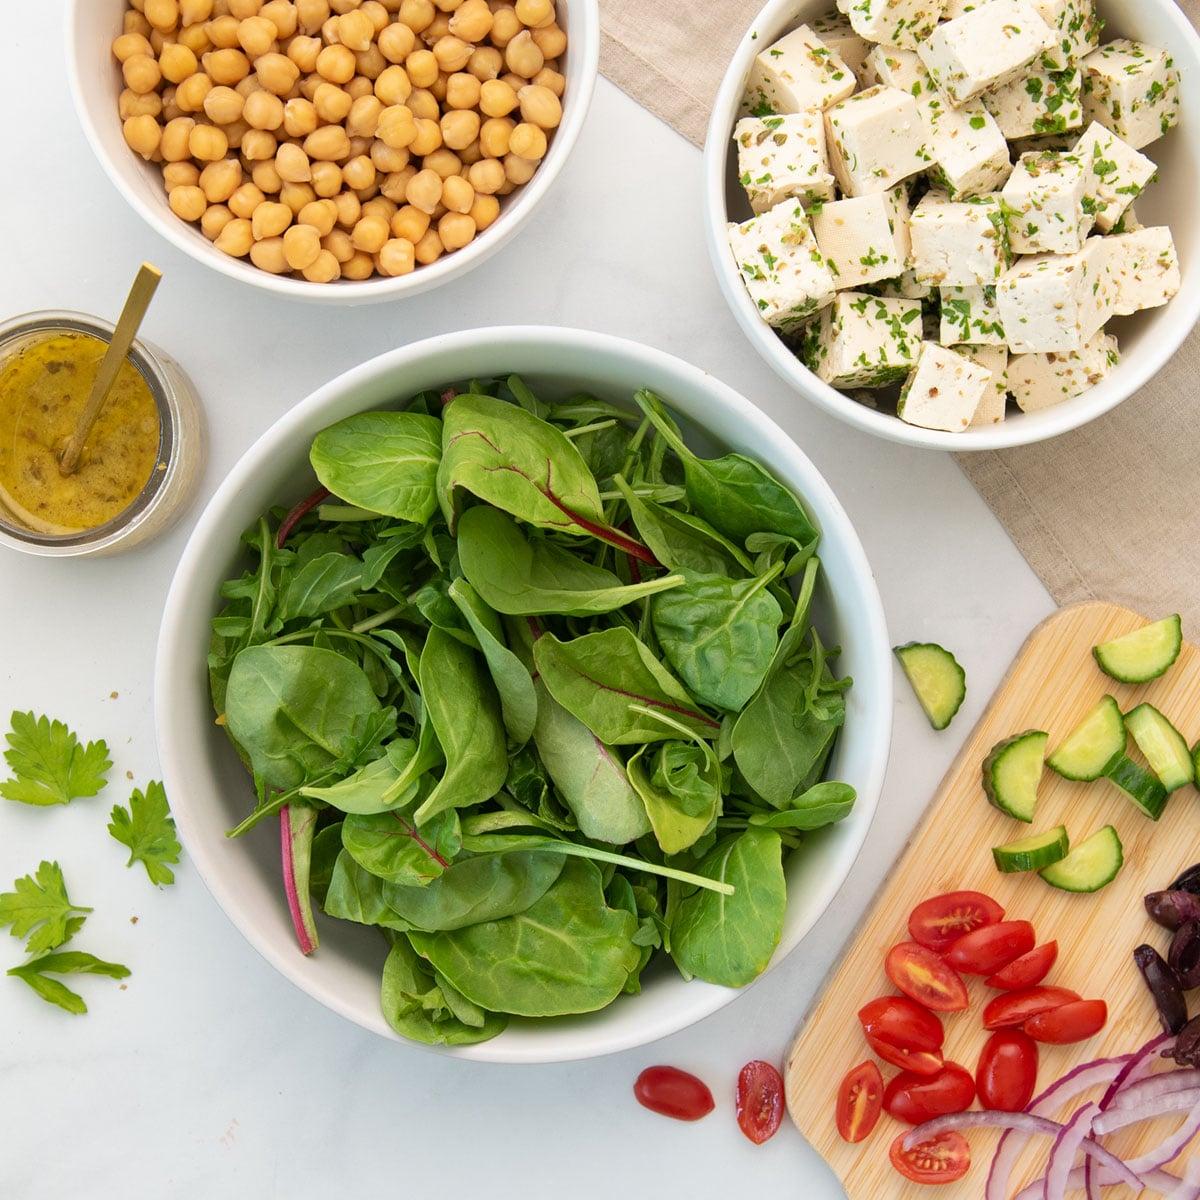 greens, sliced veggies, chickpeas, cubes of feta, salad dressing